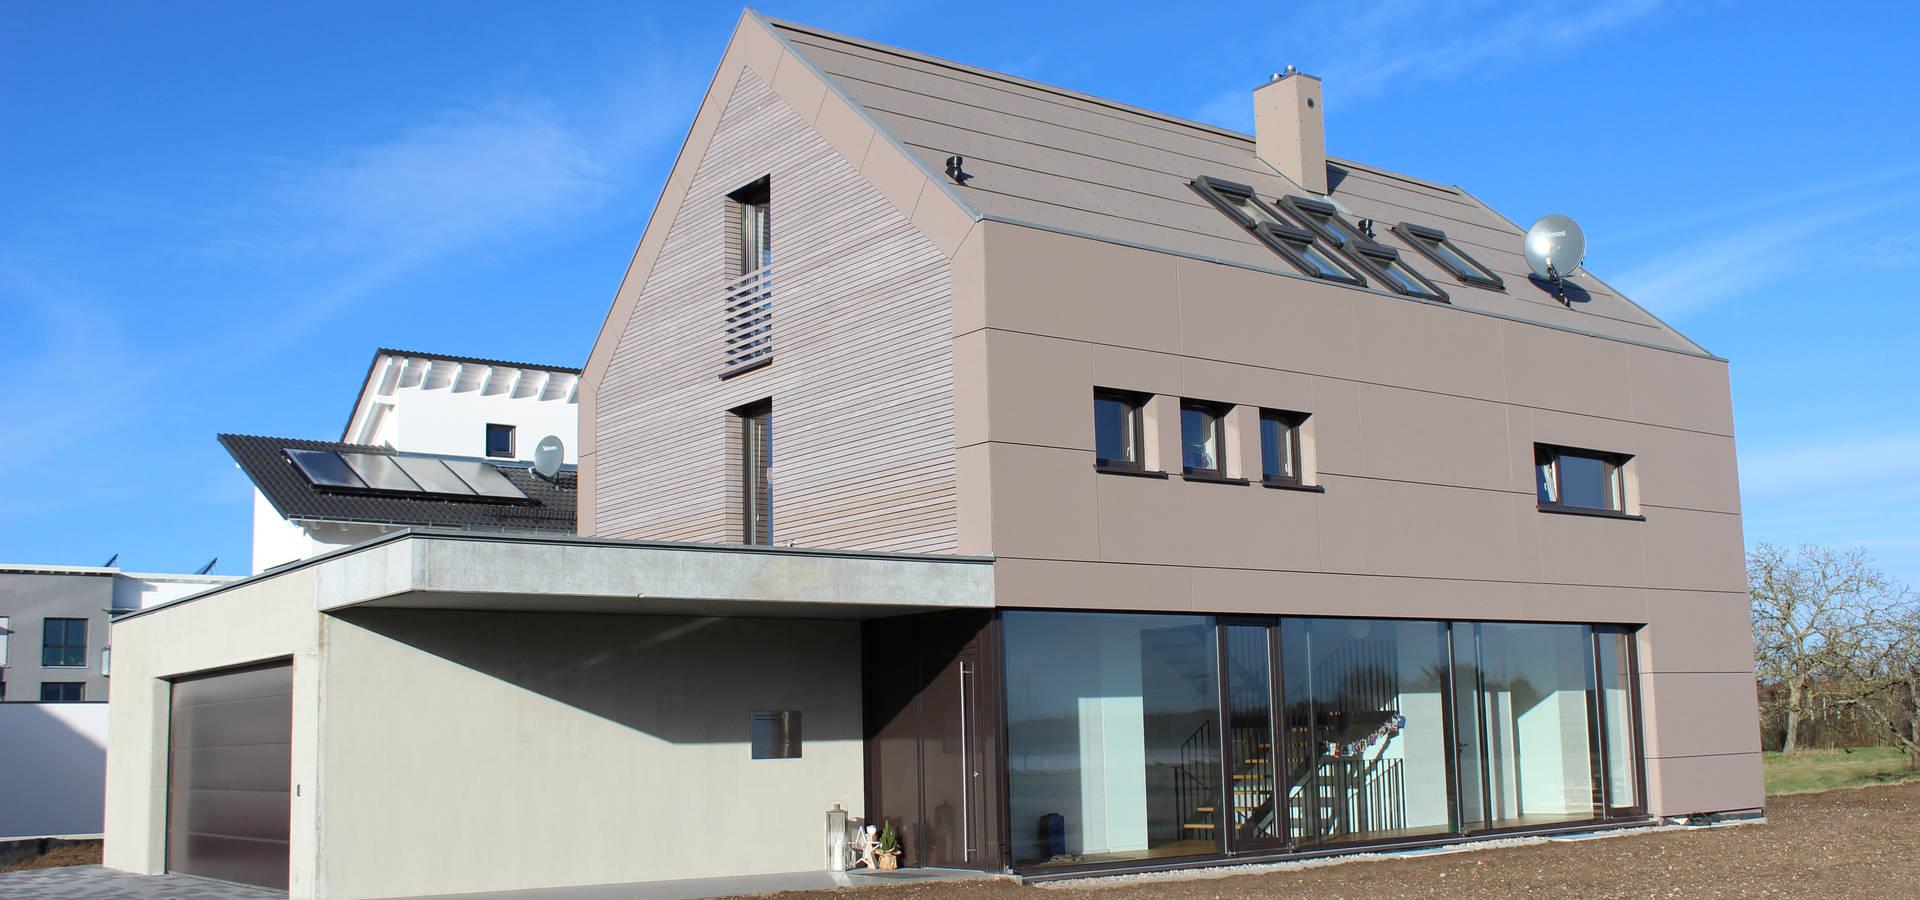 exclusiv townhouse in baden baden by kasper neininger gmbh homify. Black Bedroom Furniture Sets. Home Design Ideas